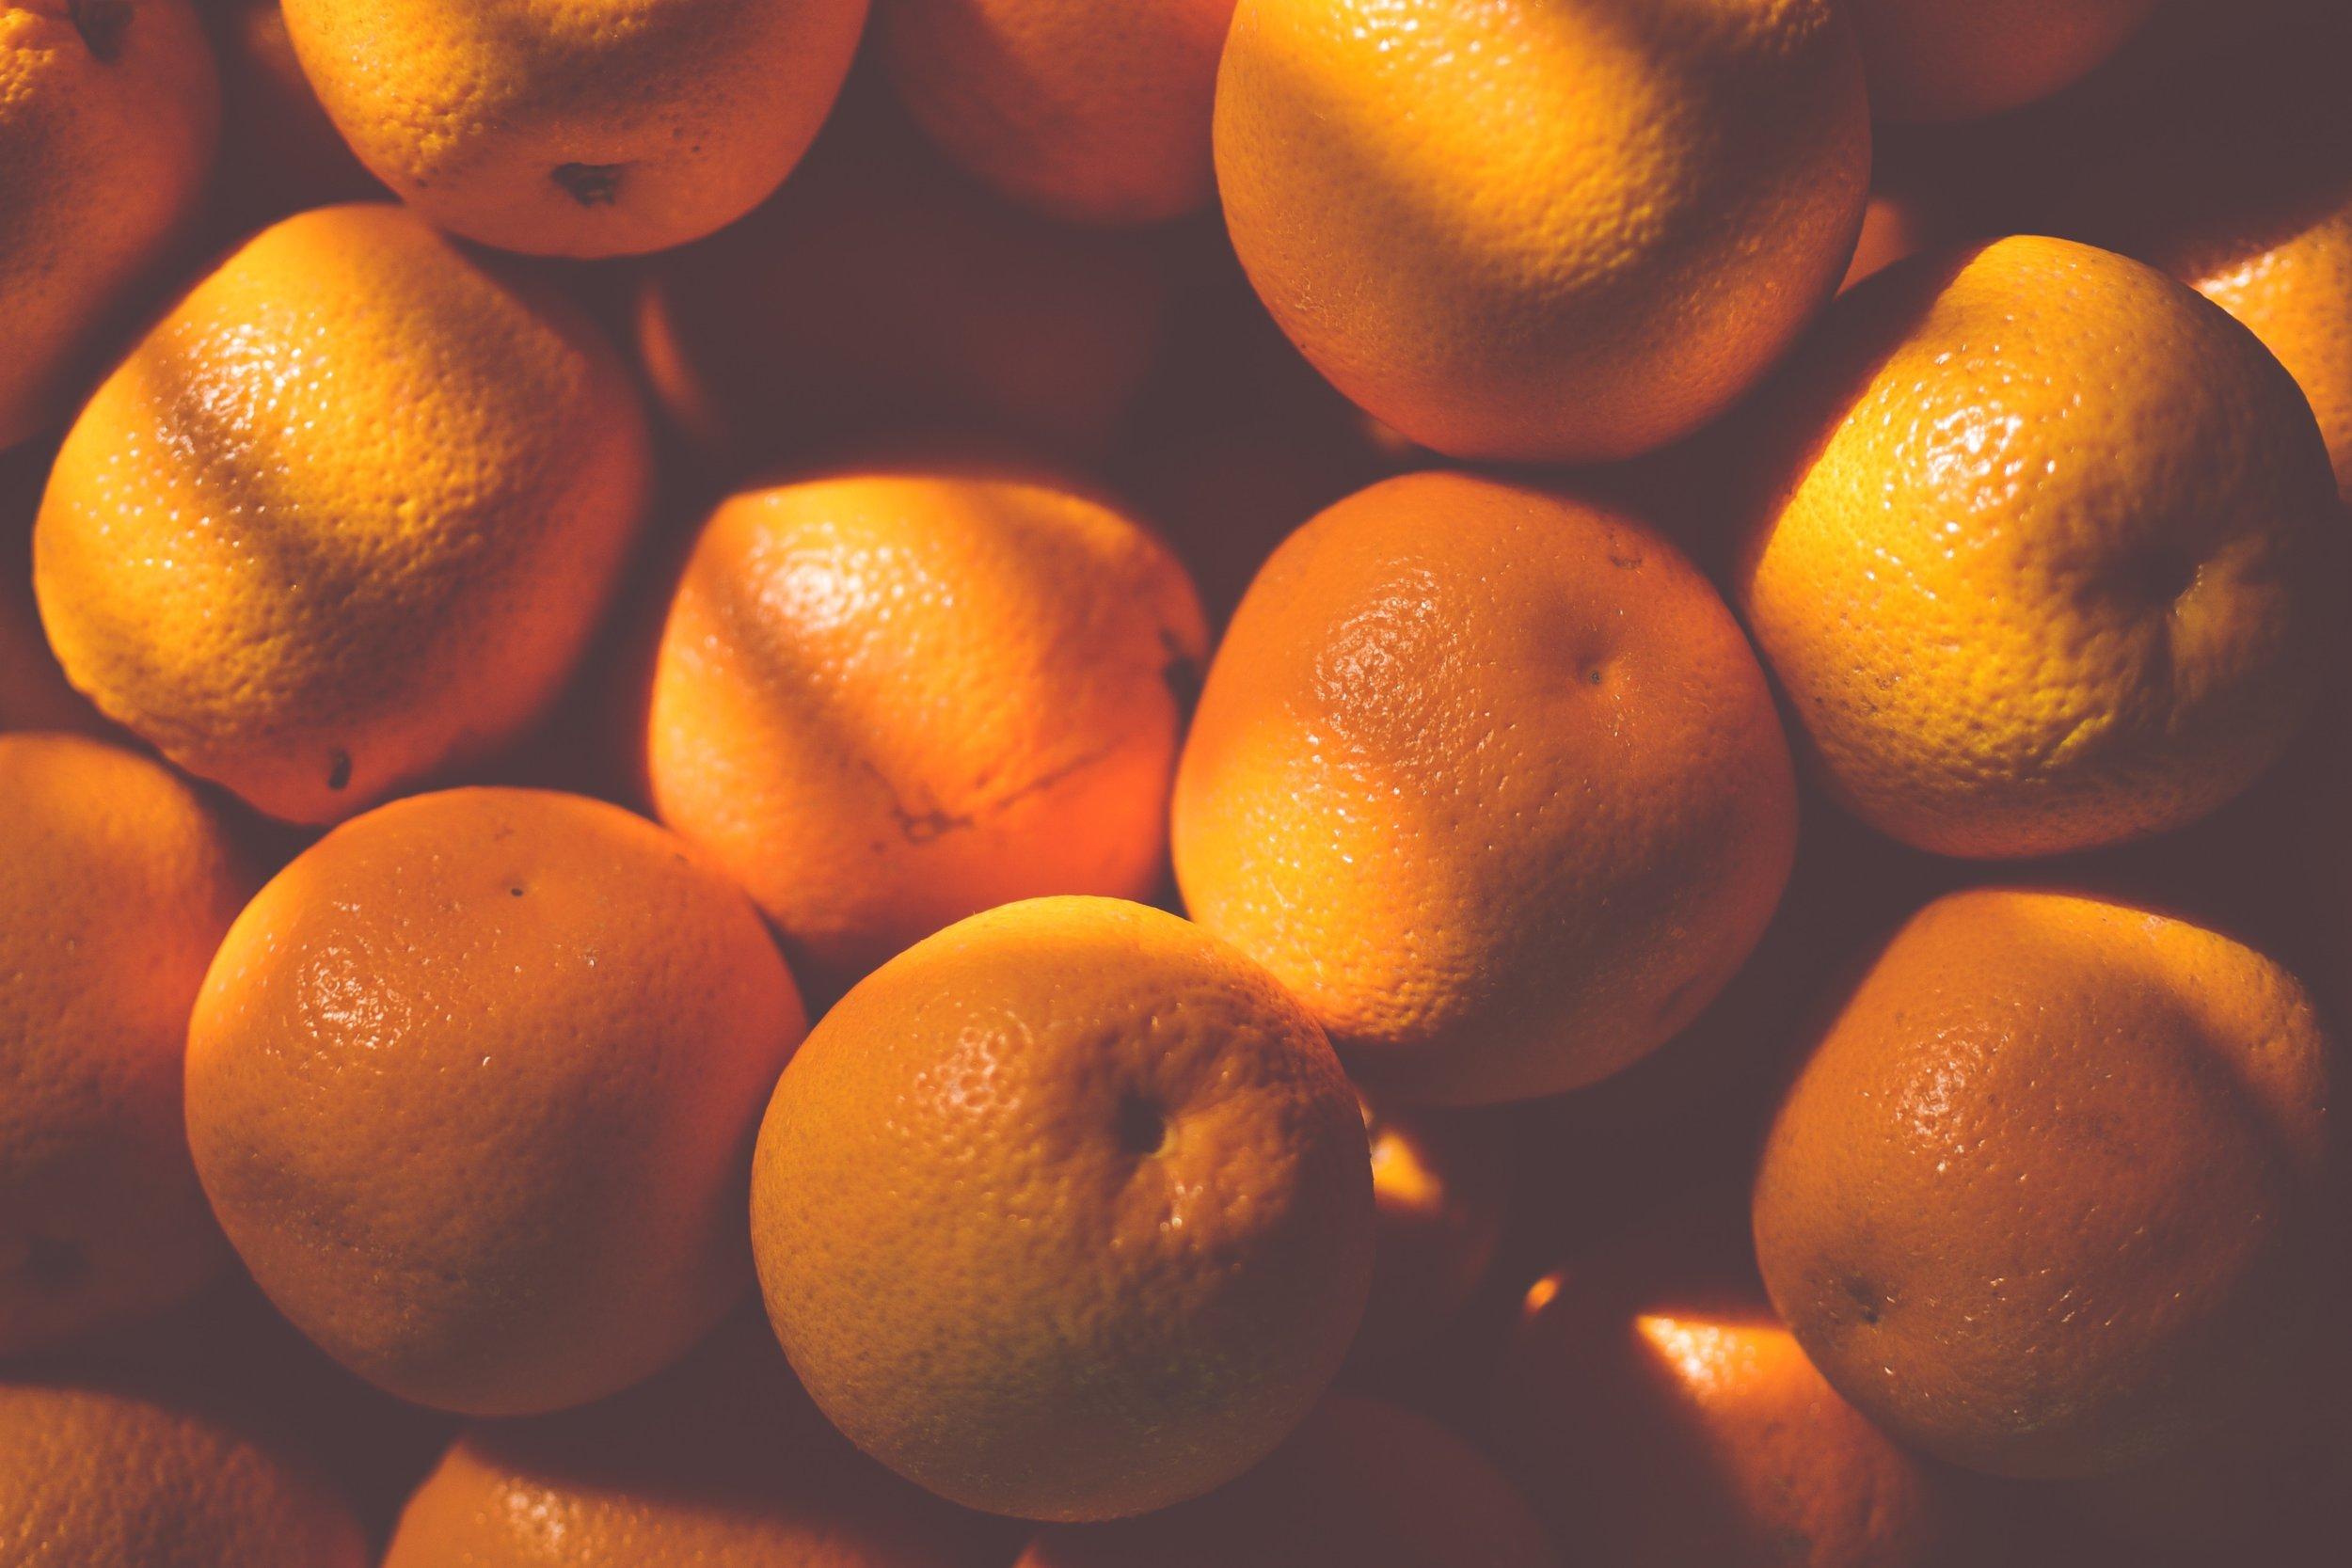 Surface Cleaner - 2 cups white distilled vinegar2 cups water20-30 drops essential oil (use a citrus like grapefruit, orange or lemon)